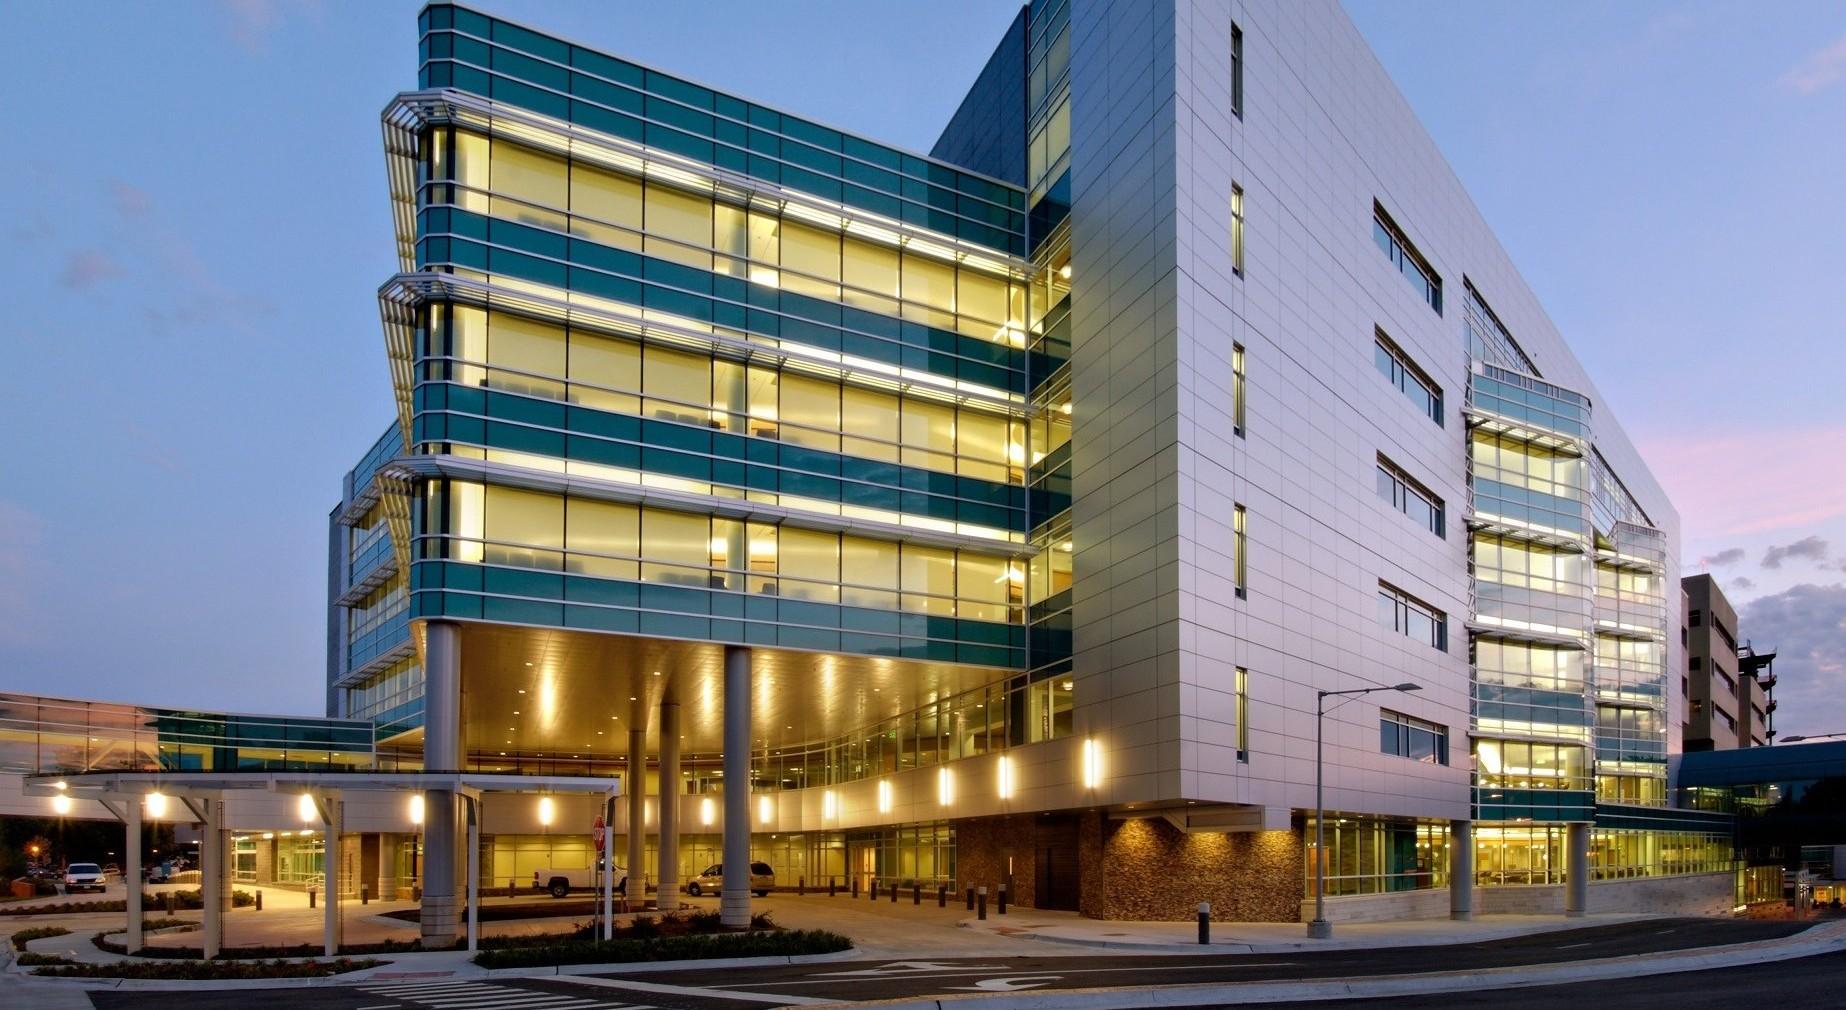 University of Kansas Physicians Medical Office Building